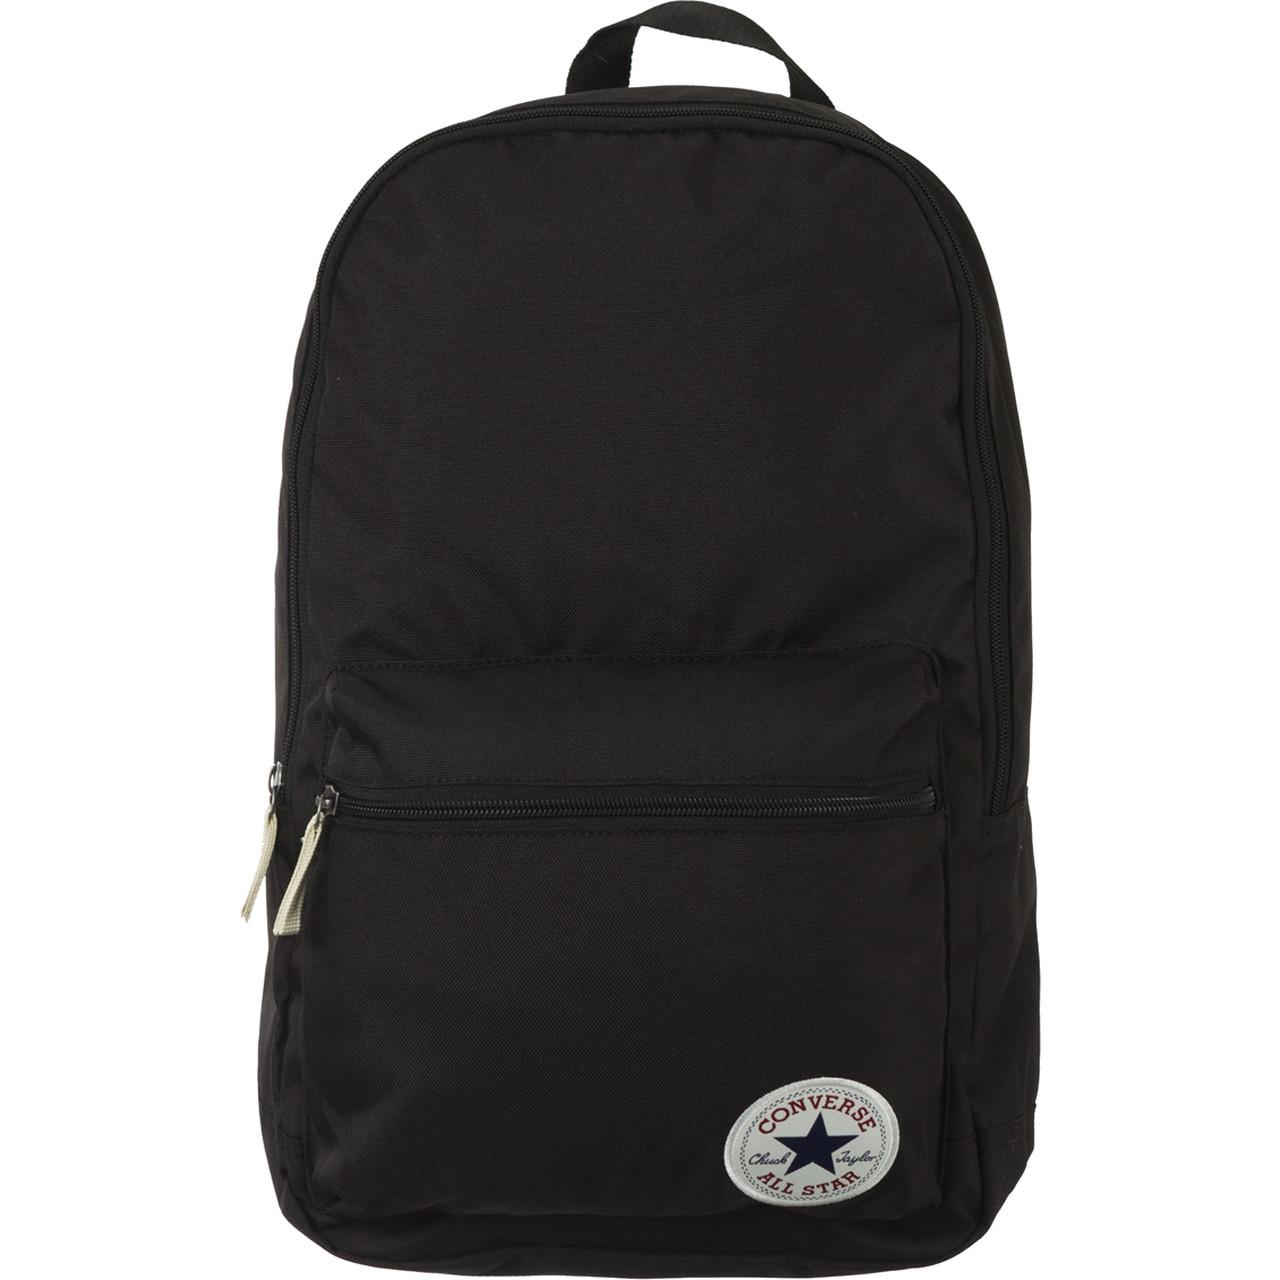 37a6fbcc3b6bb Plecak CONVERSE - 10002651 625 - Torby i plecaki na laptopy ...